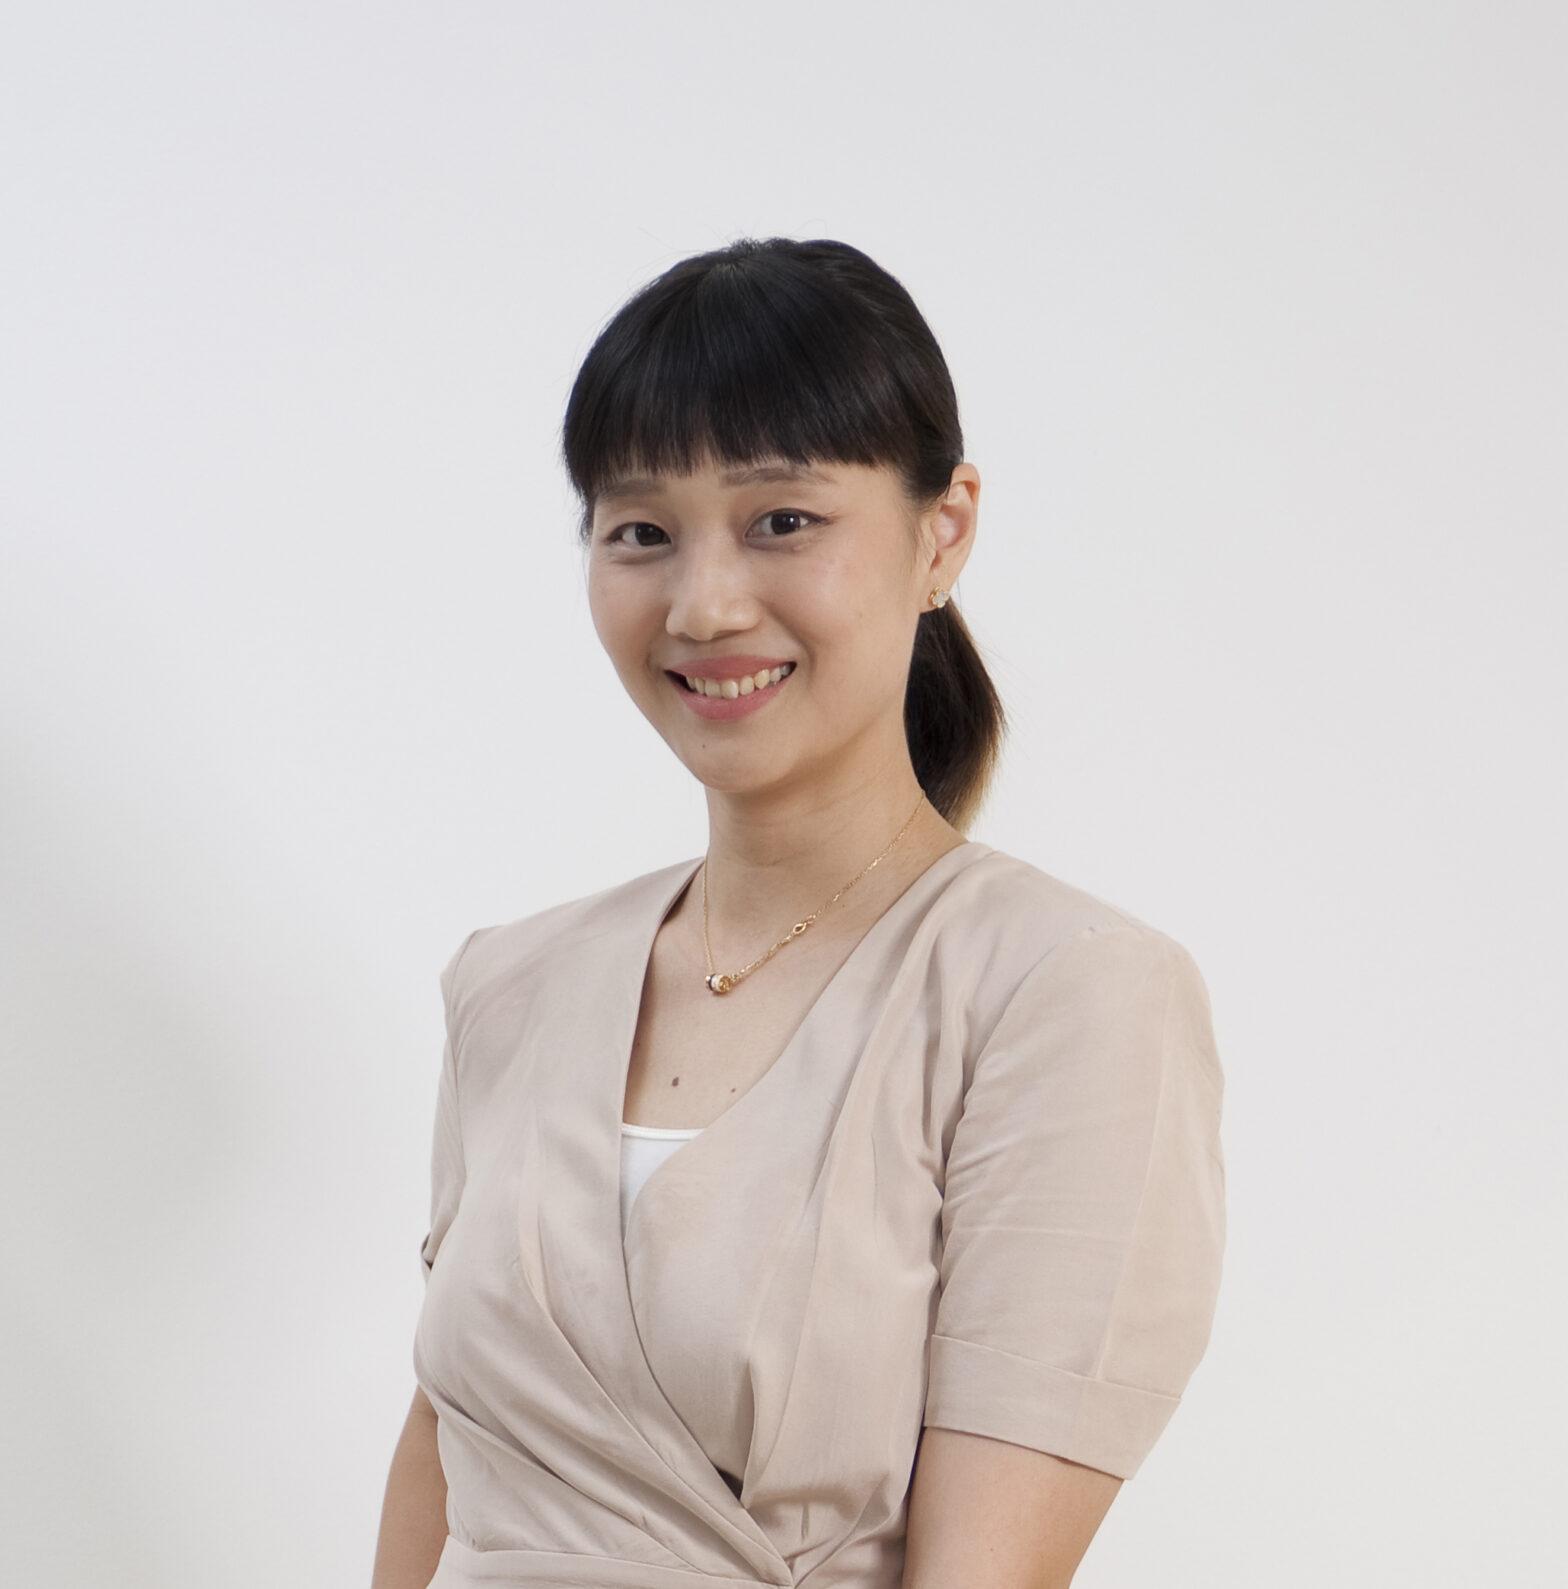 Lydea Tan